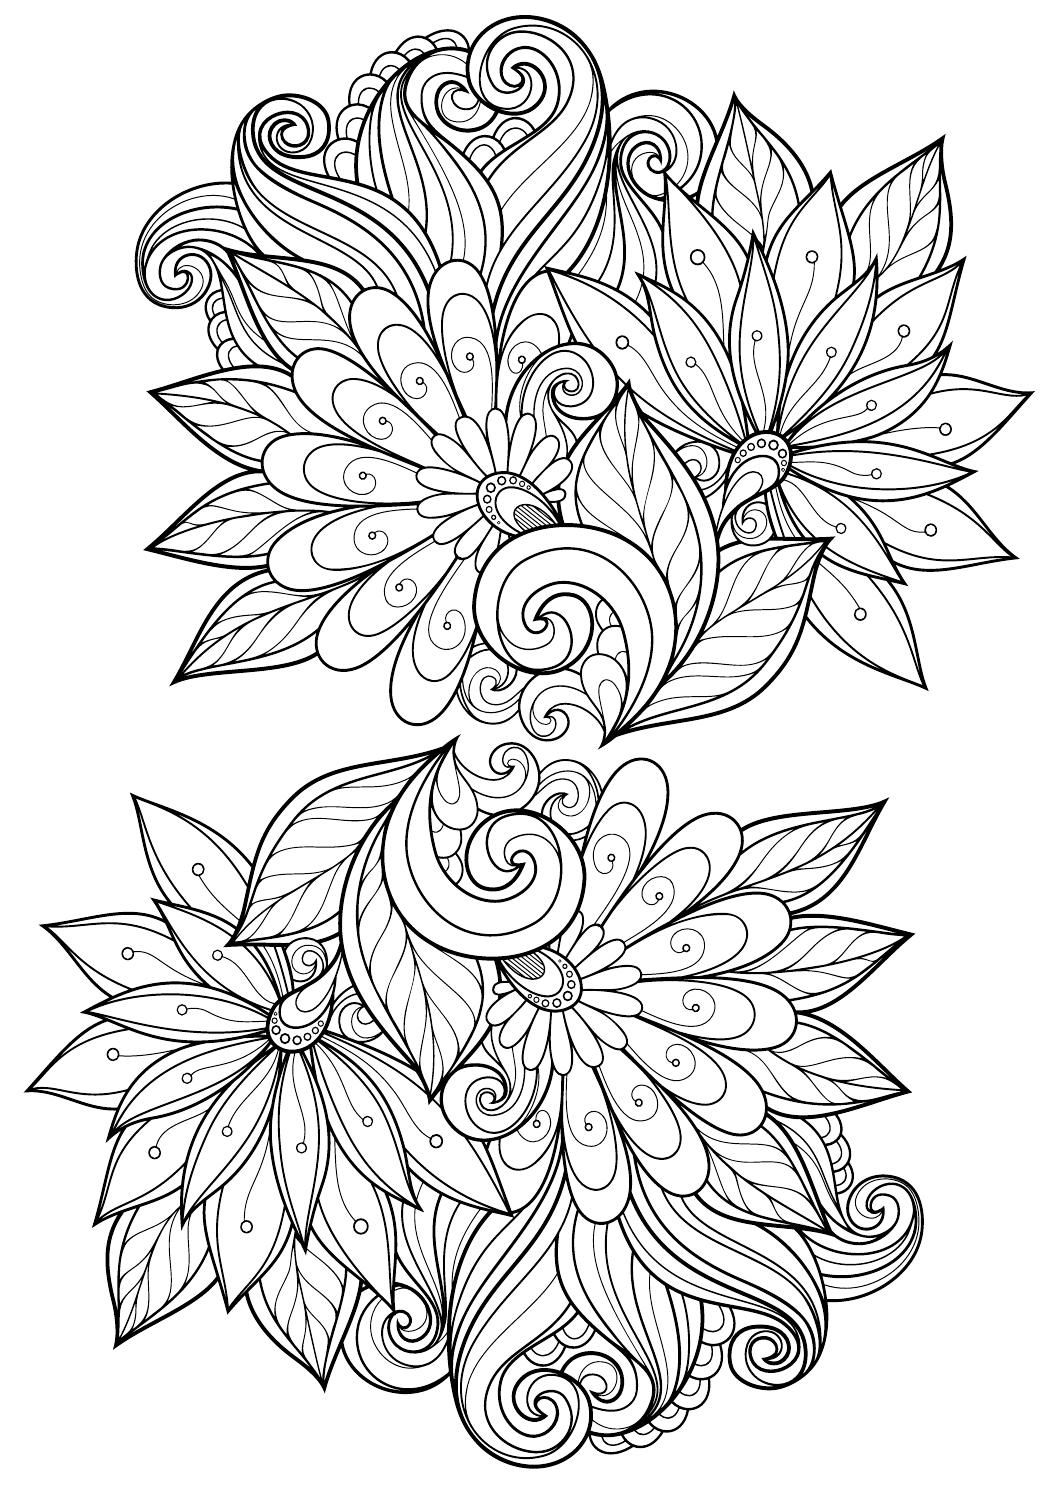 Pokoloruj Swoje Marzenia Antystresowe Kolorowanki Dla Doroslych Coloring Pages Coloring Book Art Mandala Coloring